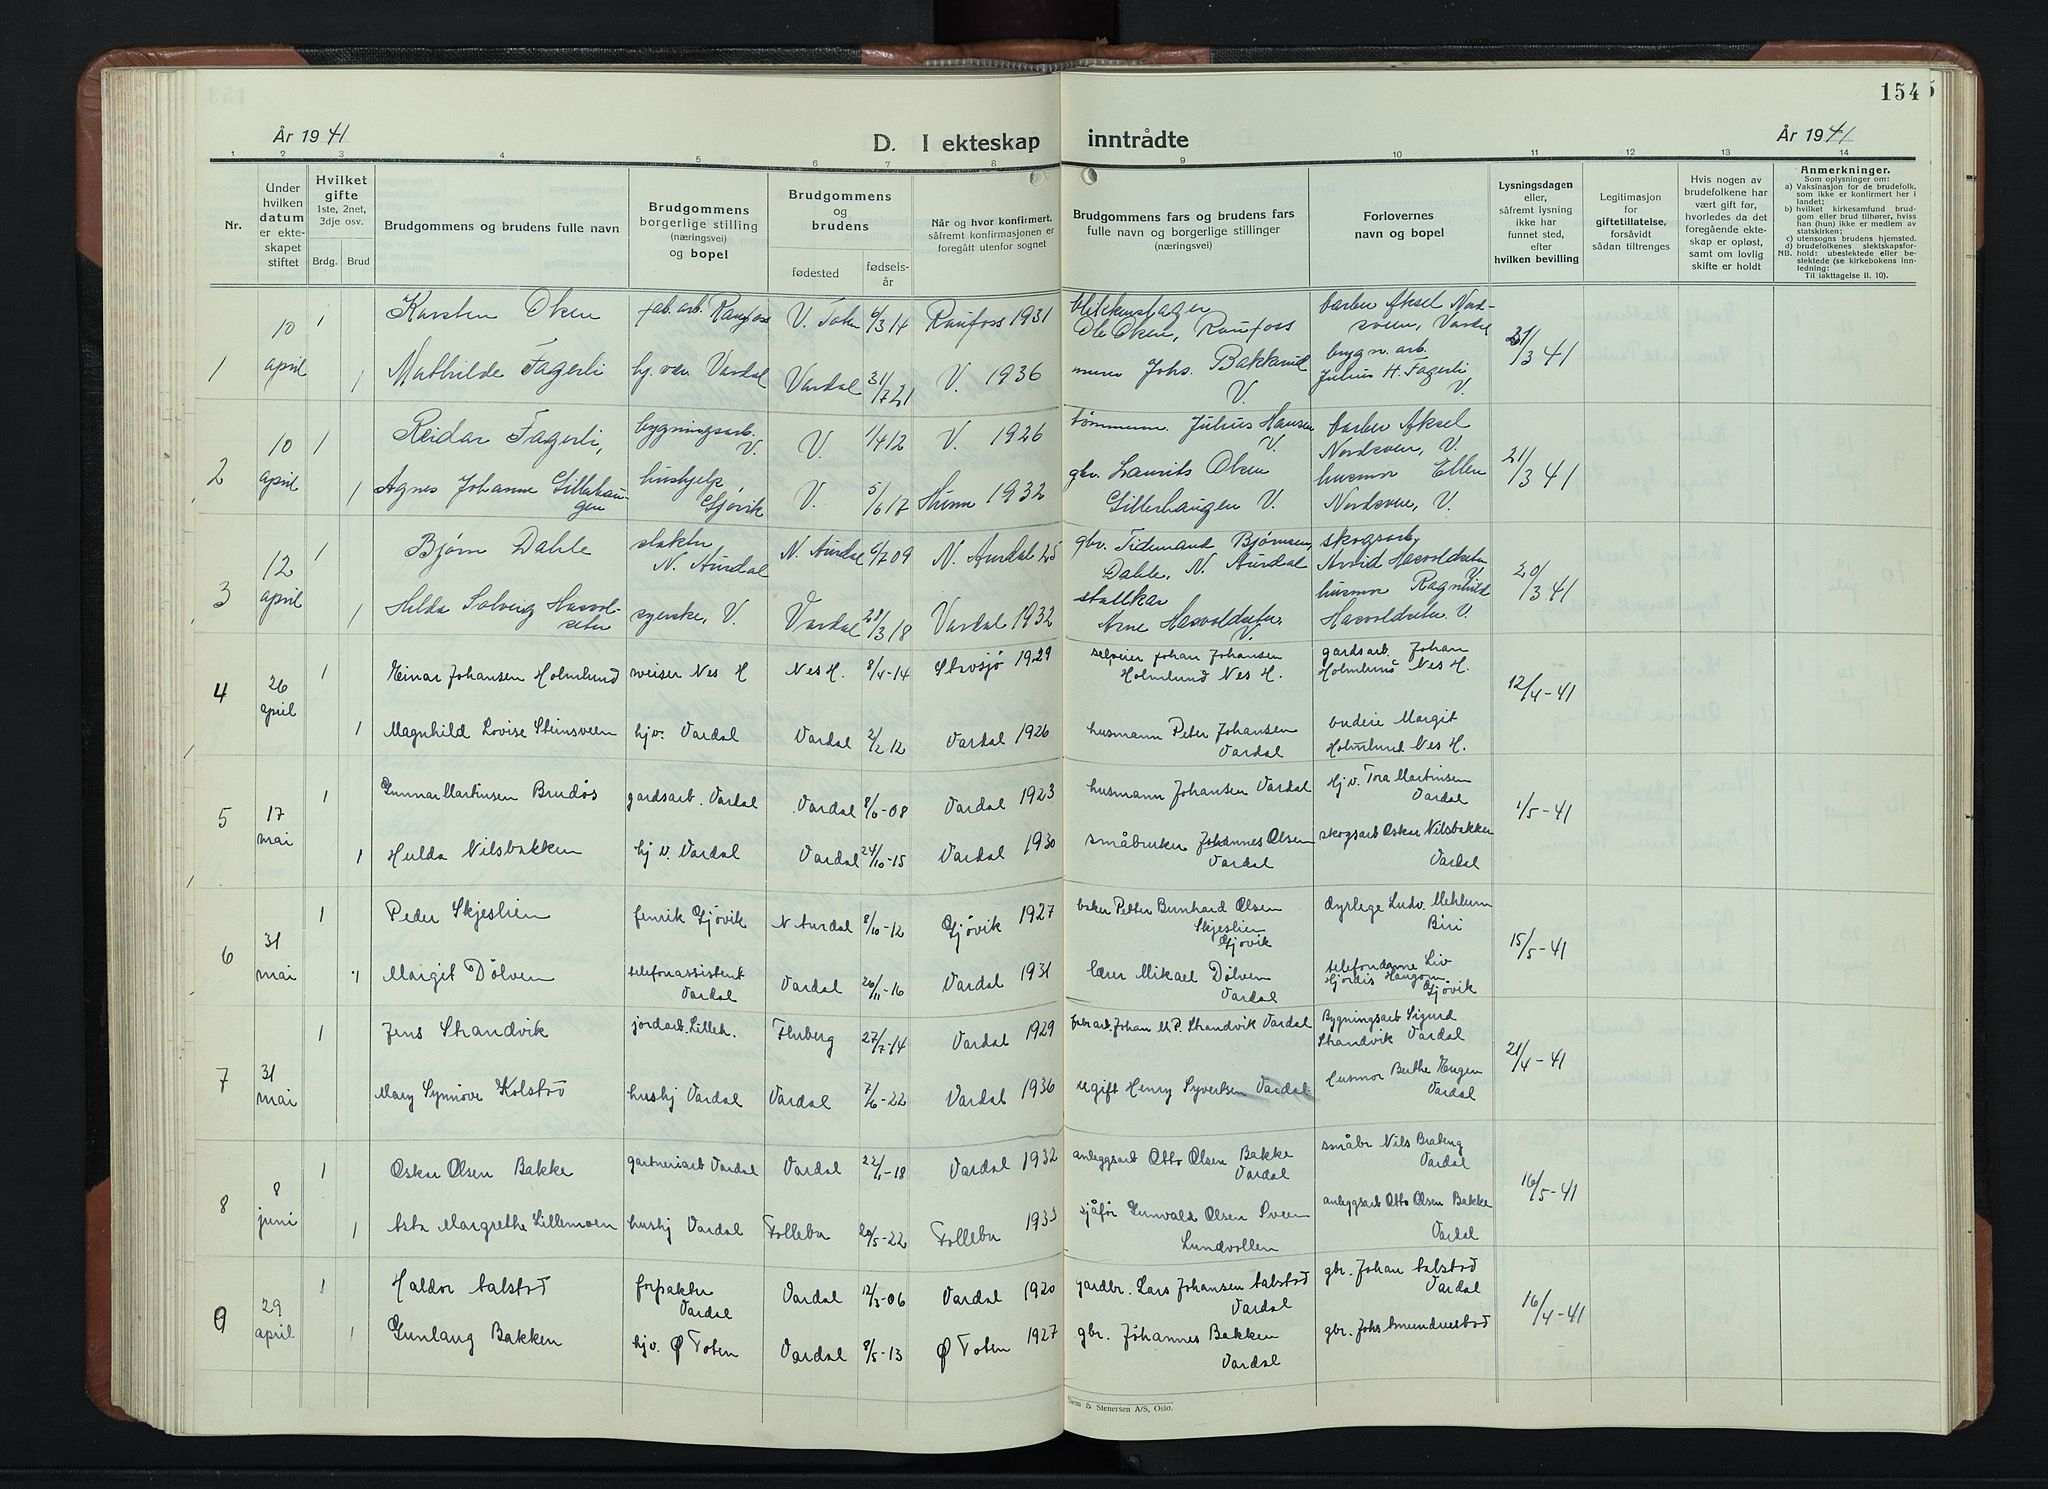 SAH, Vardal prestekontor, H/Ha/Hab/L0018: Klokkerbok nr. 18, 1931-1951, s. 154